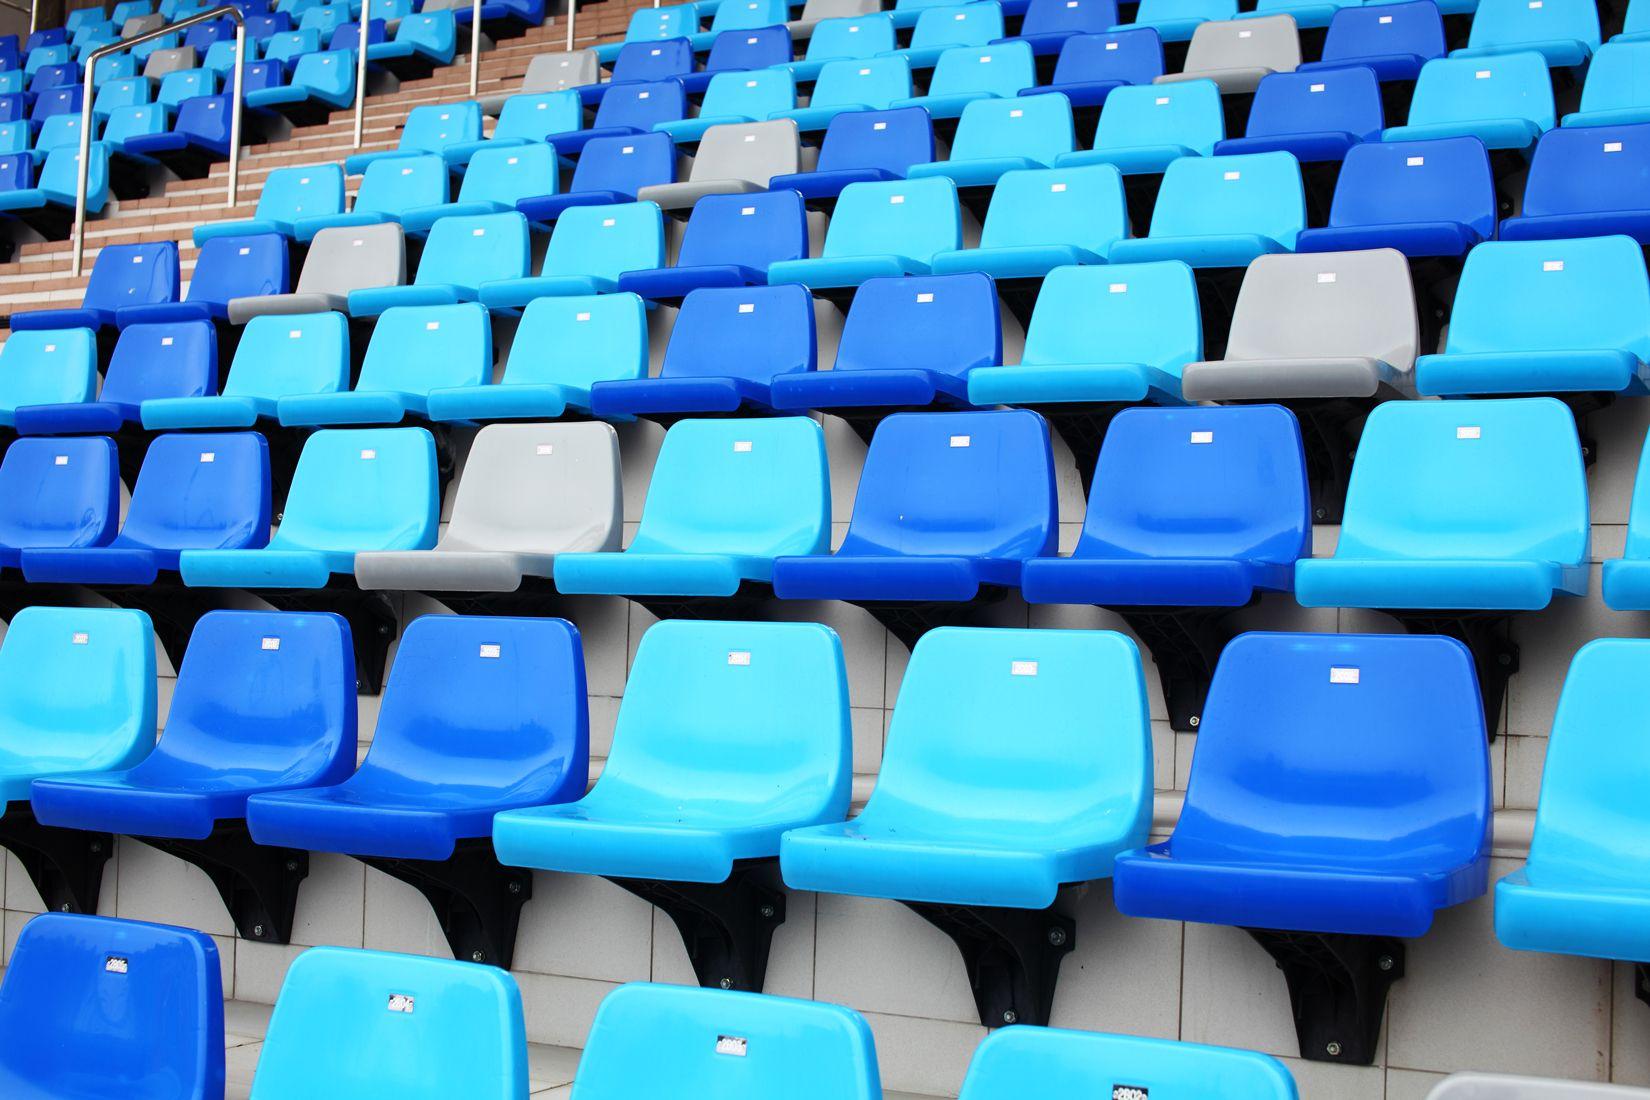 Audience Seat In Stadium Ismail Sirdah